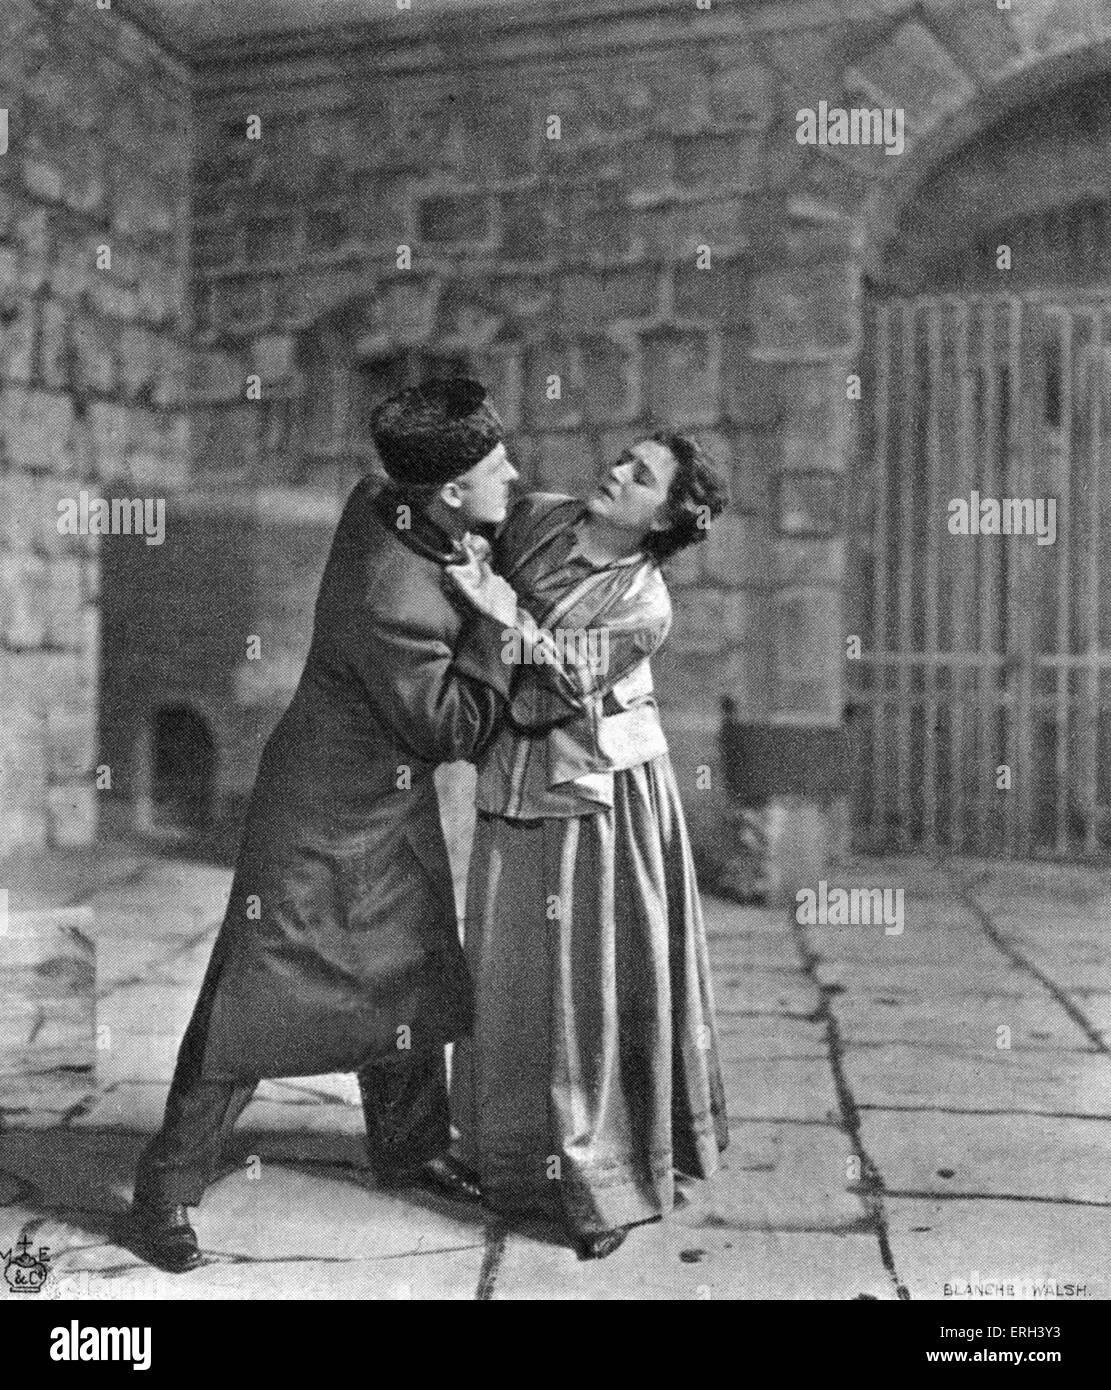 'Resurrection'.  Novel by Leo Tolstoy.  Nehludov, the protagonist, begs his former mistress Katusha to forsake - Stock Image